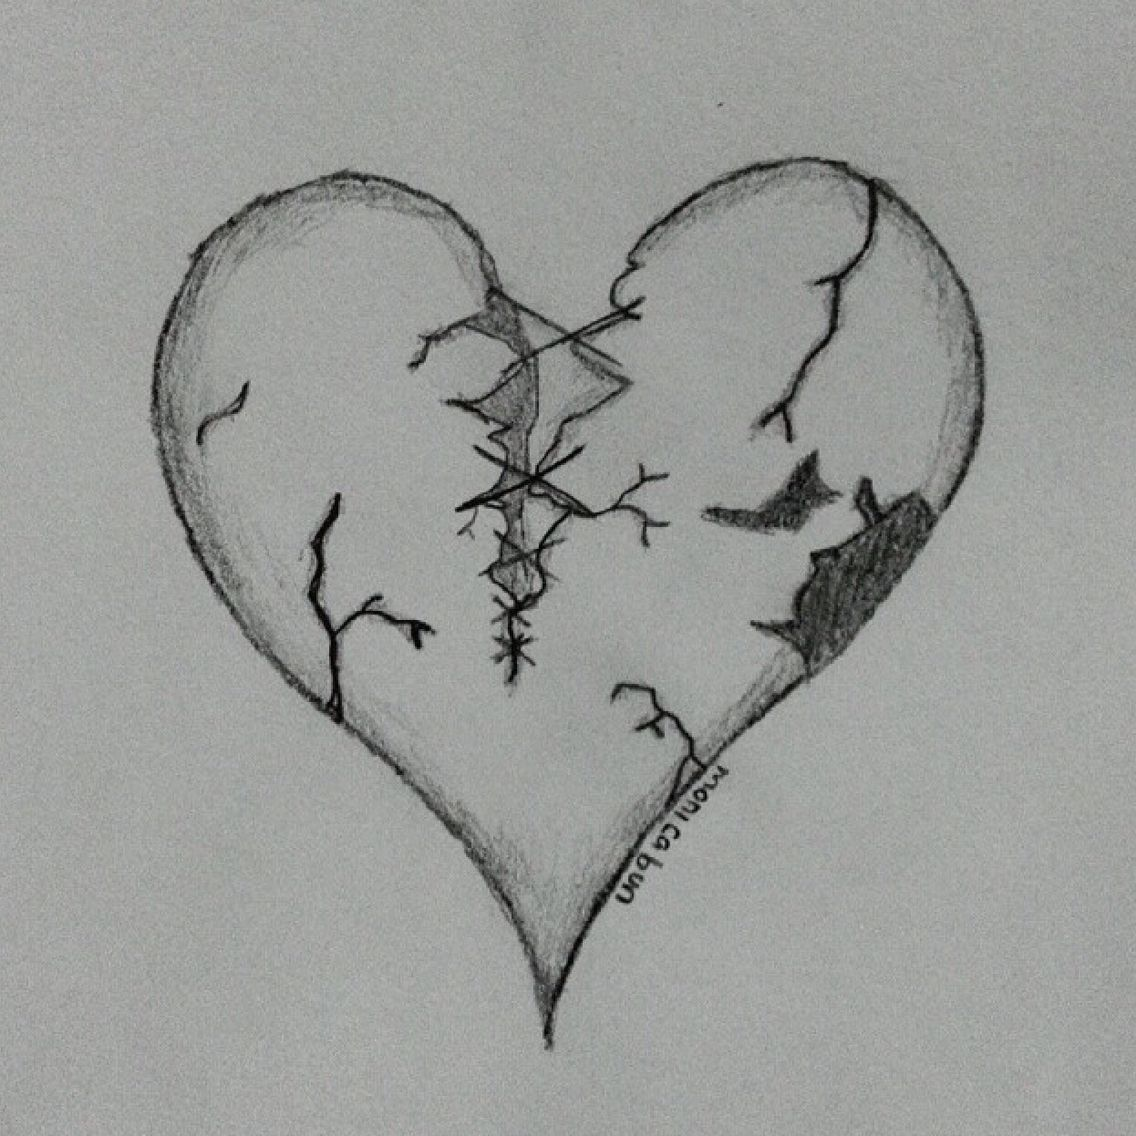 Just a broken hearted art sketch black color draw book pencil paper drawing pen drawingpen